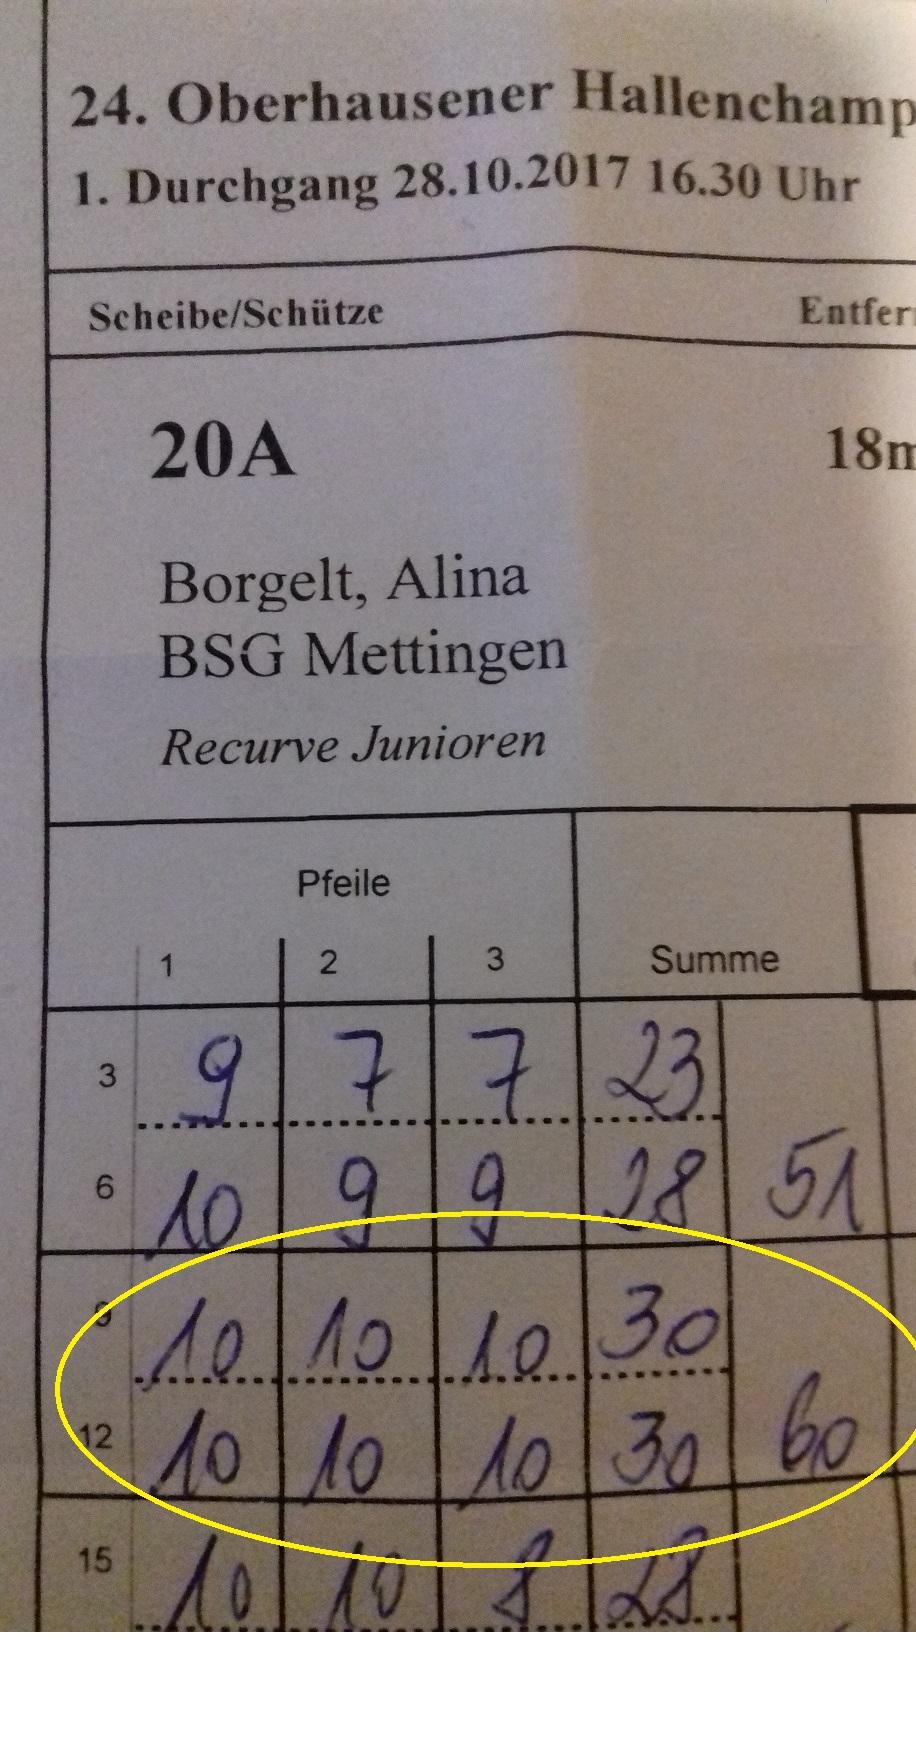 Alina 2017 (NRW Hallenchampionat Oberhausen)